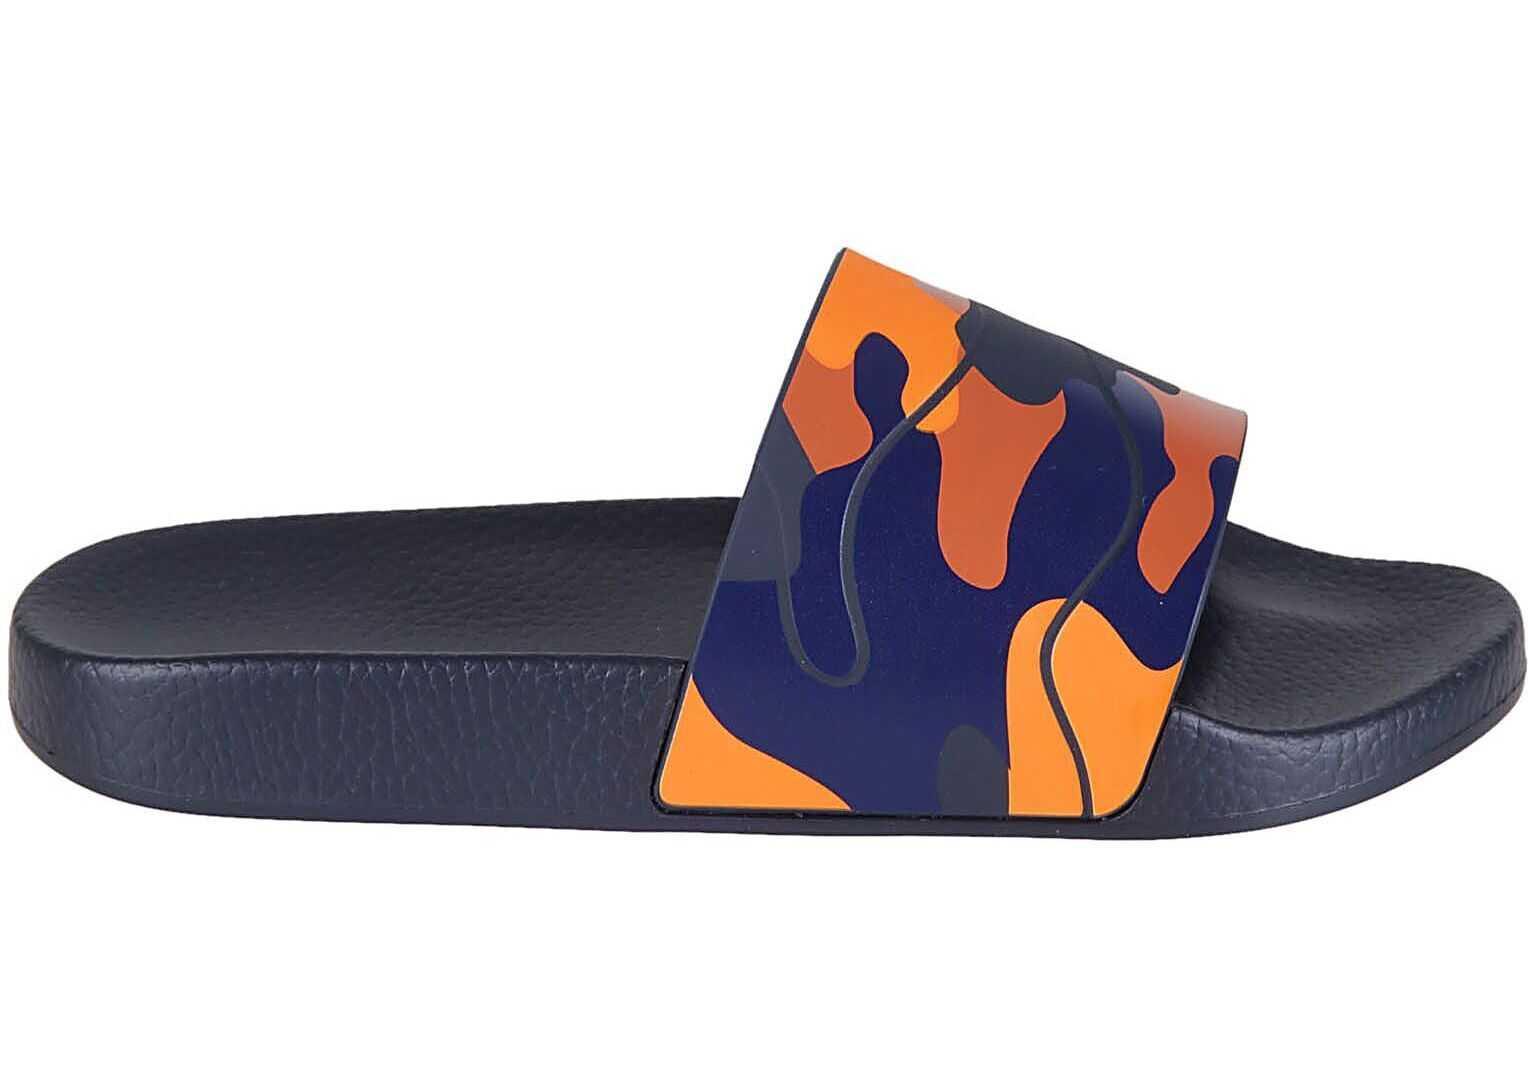 Valentino Garavani Rubber Sandals BLUE